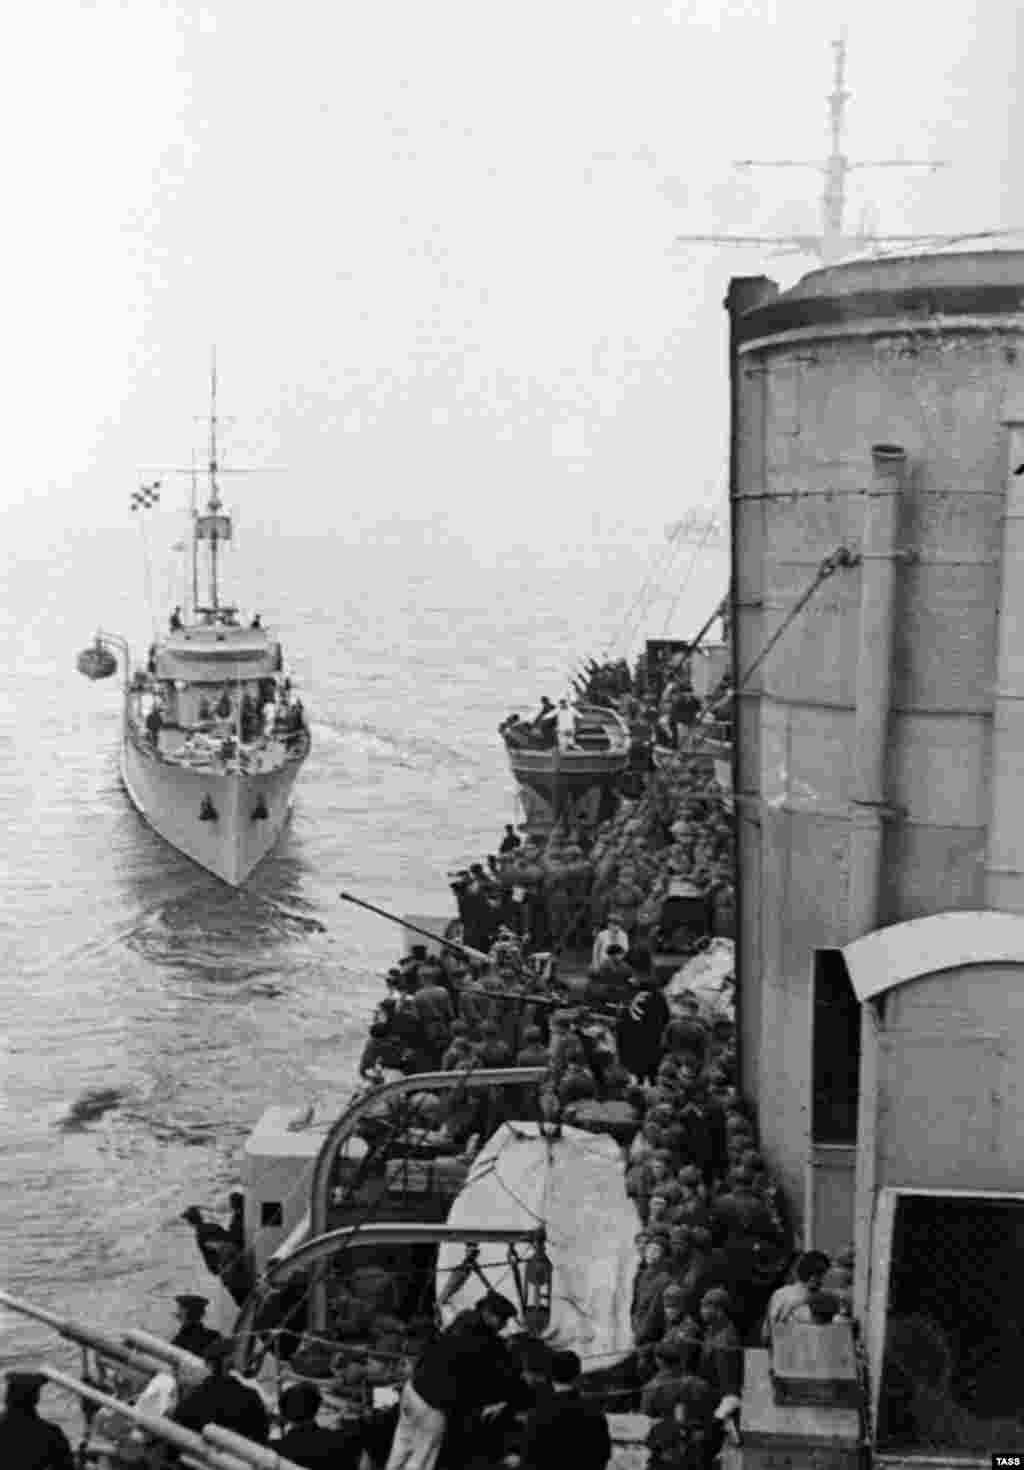 Soviet Union -- The Black Sea Fleet. Krasny Krym cruiser of guards, Crimea, 1942